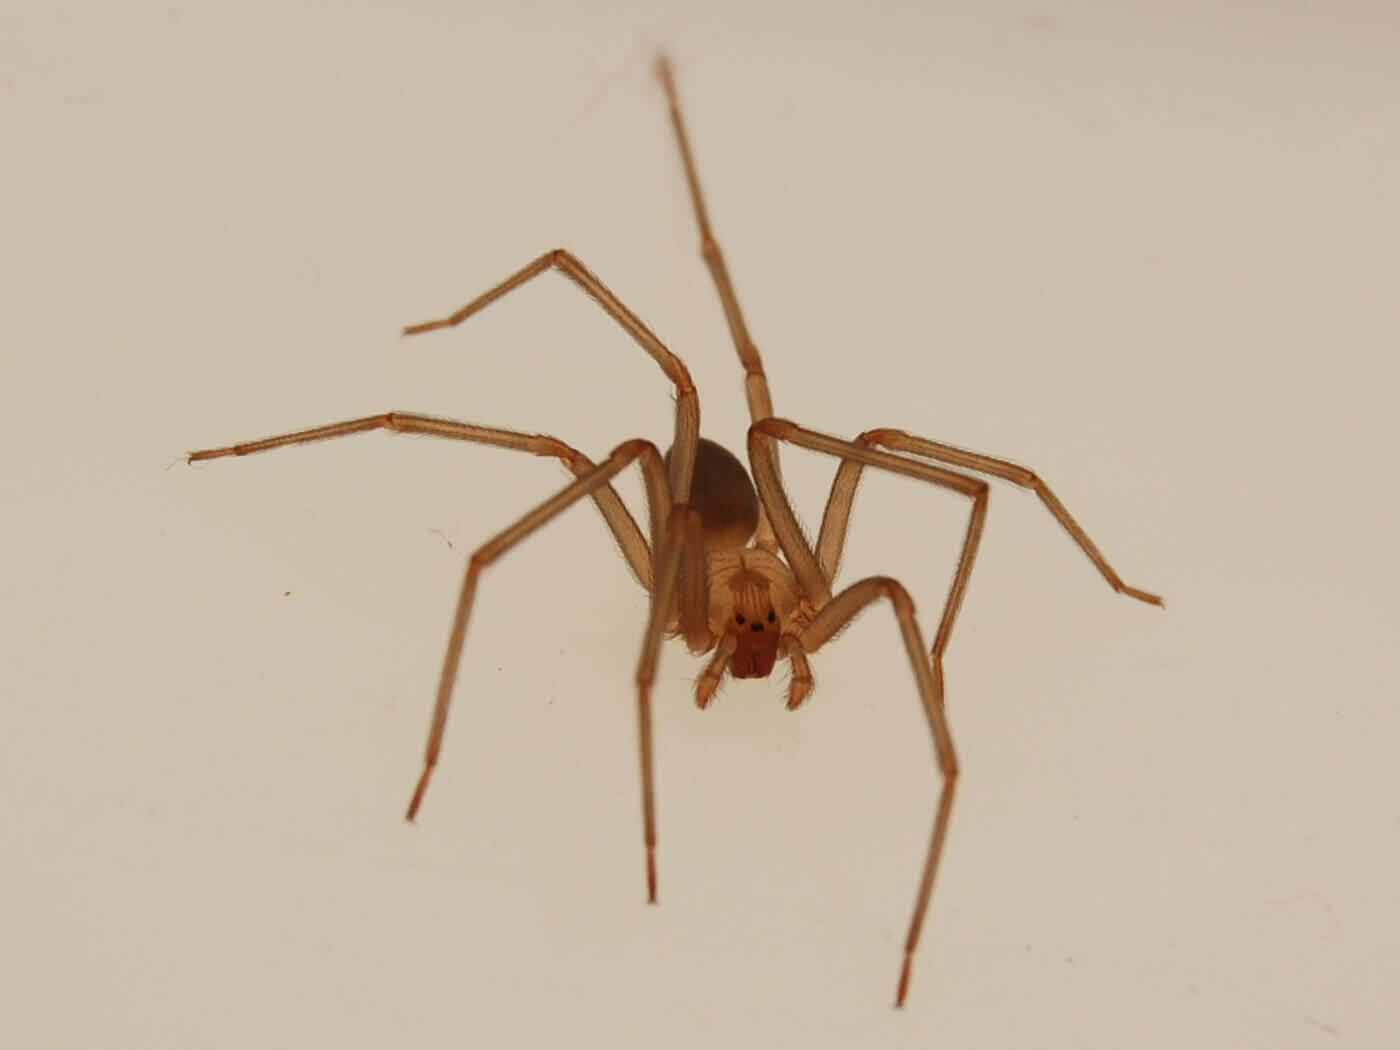 Spider bite symptoms